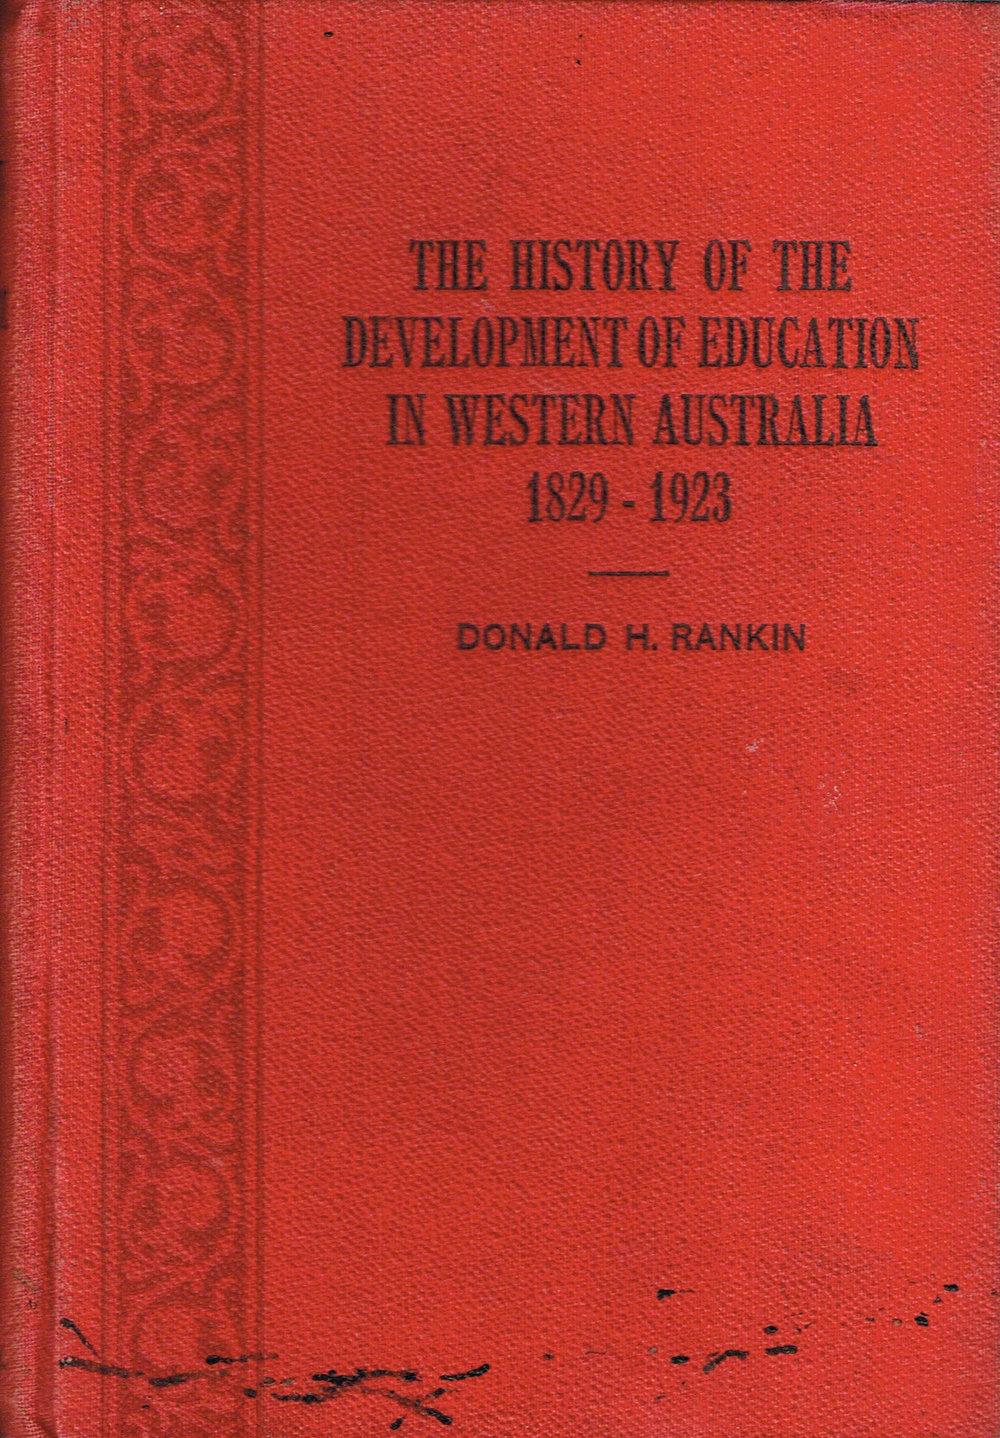 The history of the development of education in Western Australia, 1829 - 1923   Donald Hamilton Rankin (1880-1974).